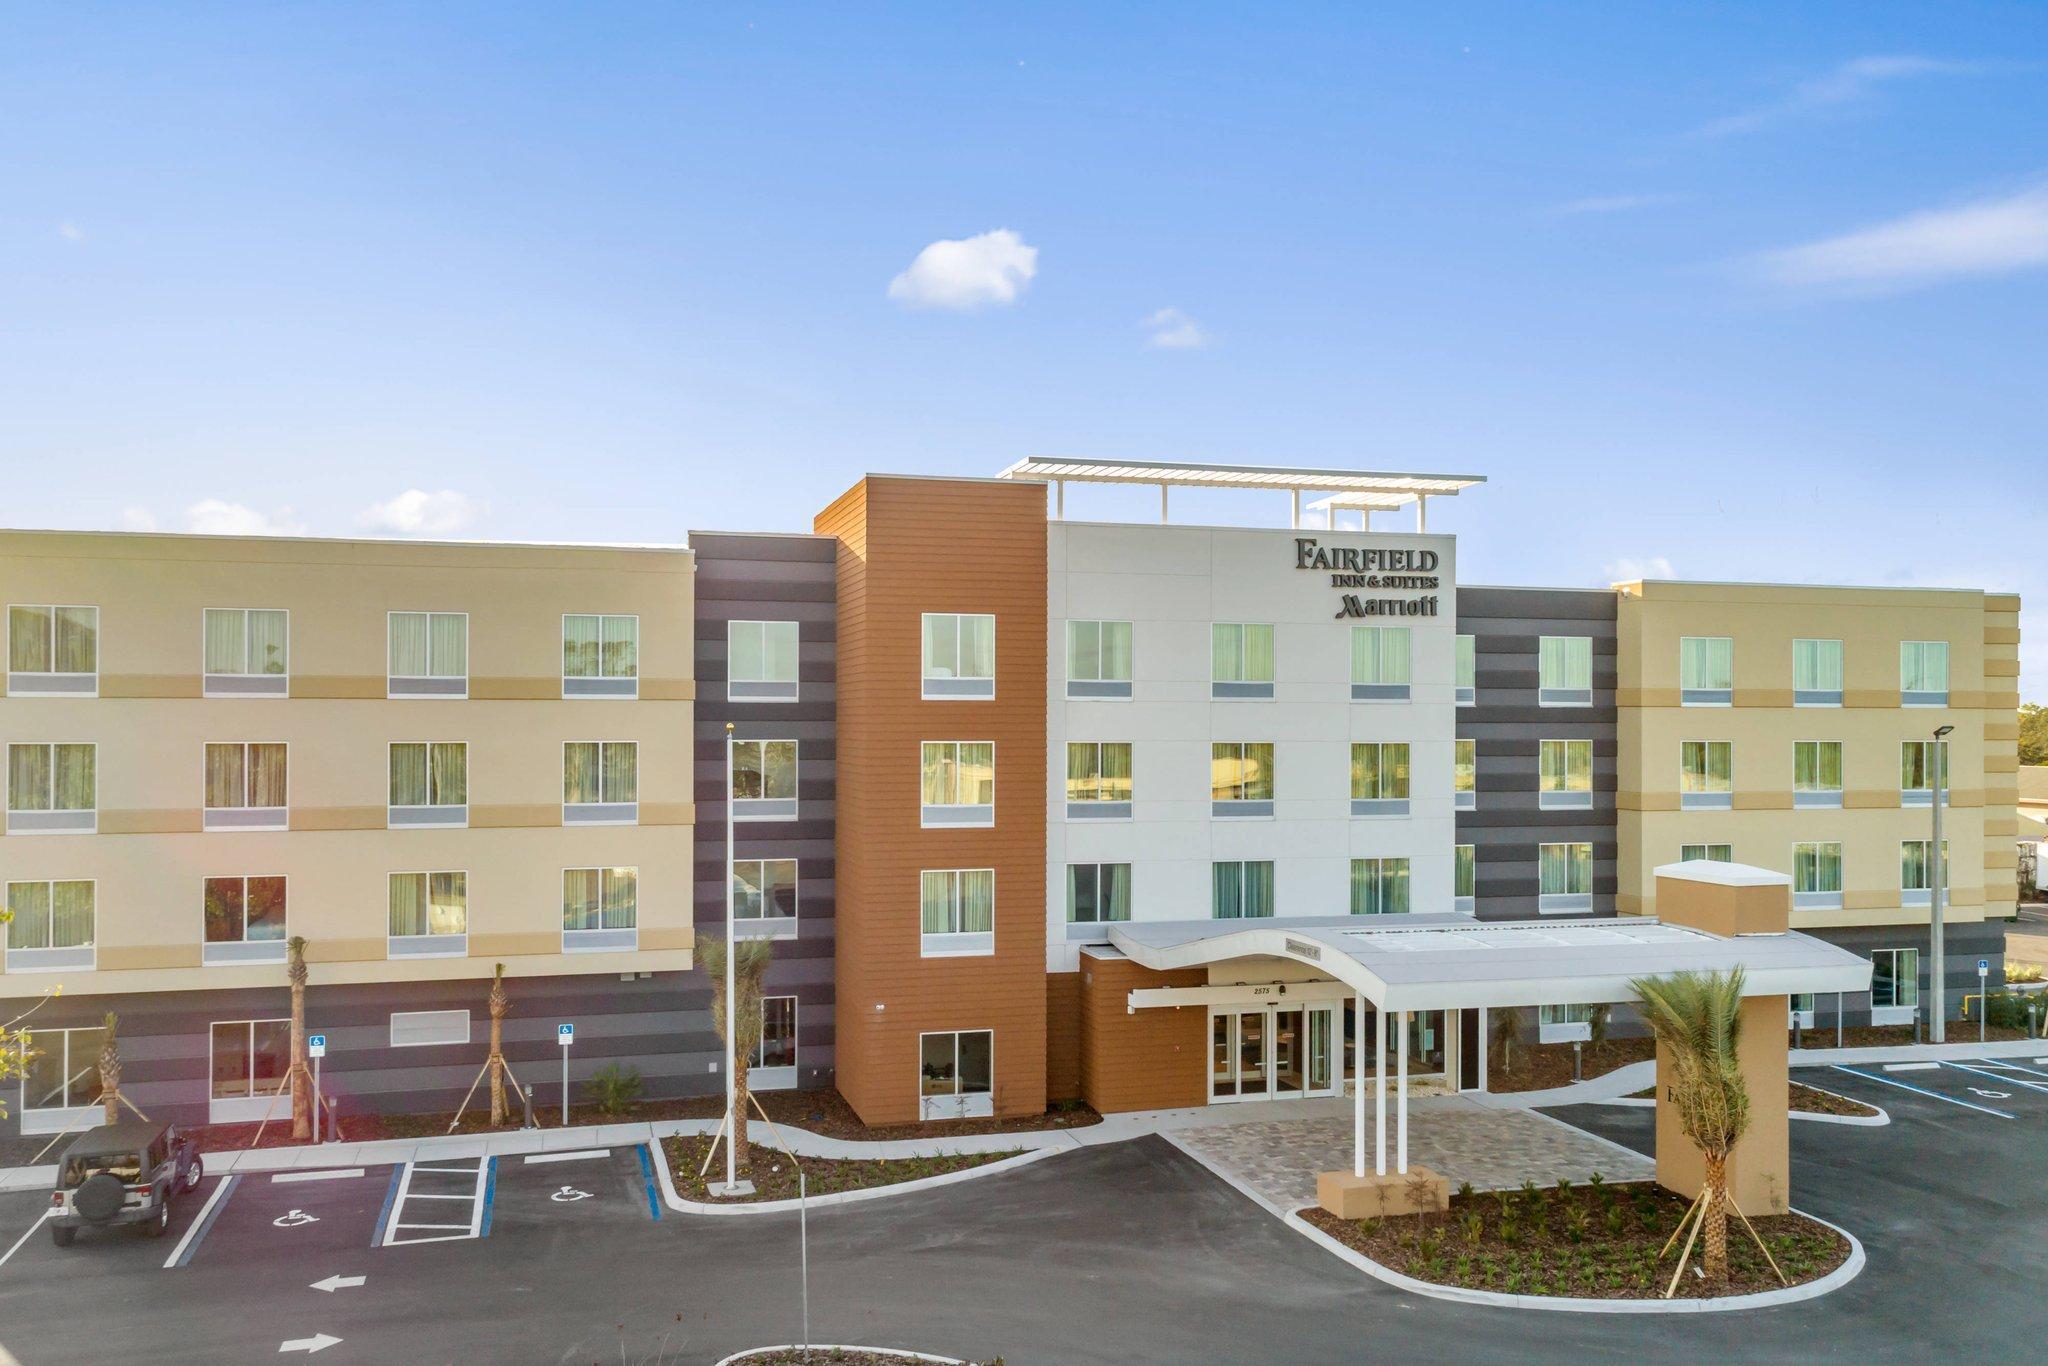 Fairfield Inn And Suites St Petersburg North